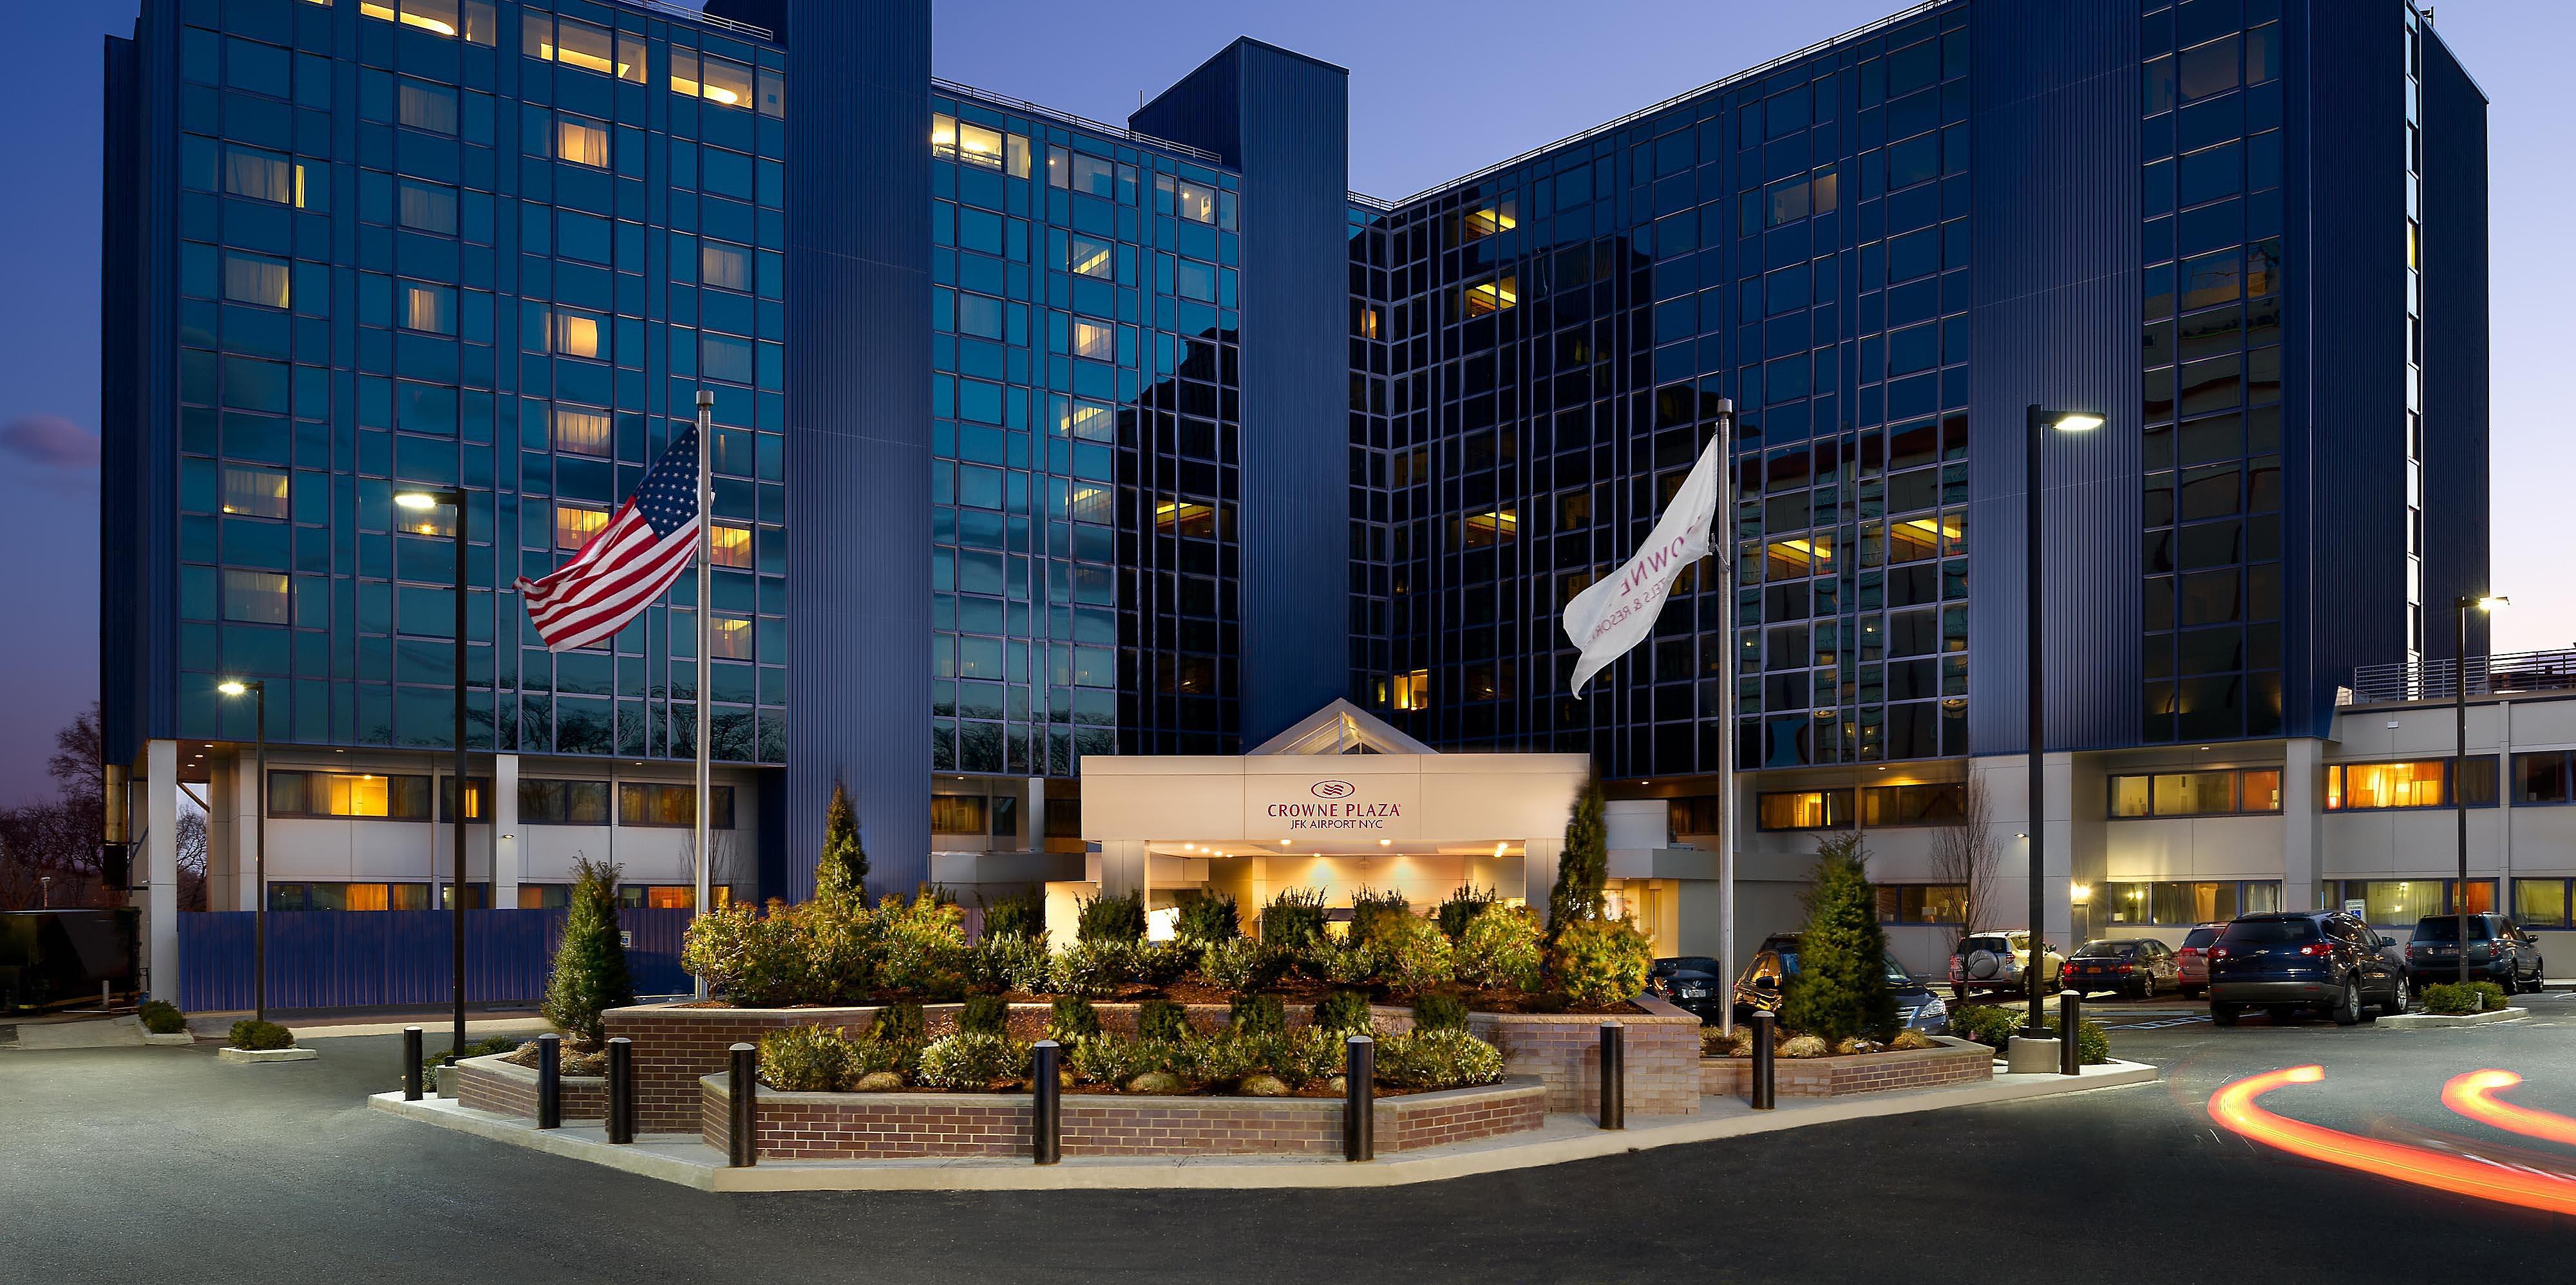 Hotels Near Jfk >> Jfk Airport Hotels In Jamaica Queens Crowne Plaza Jfk Airport Nyc